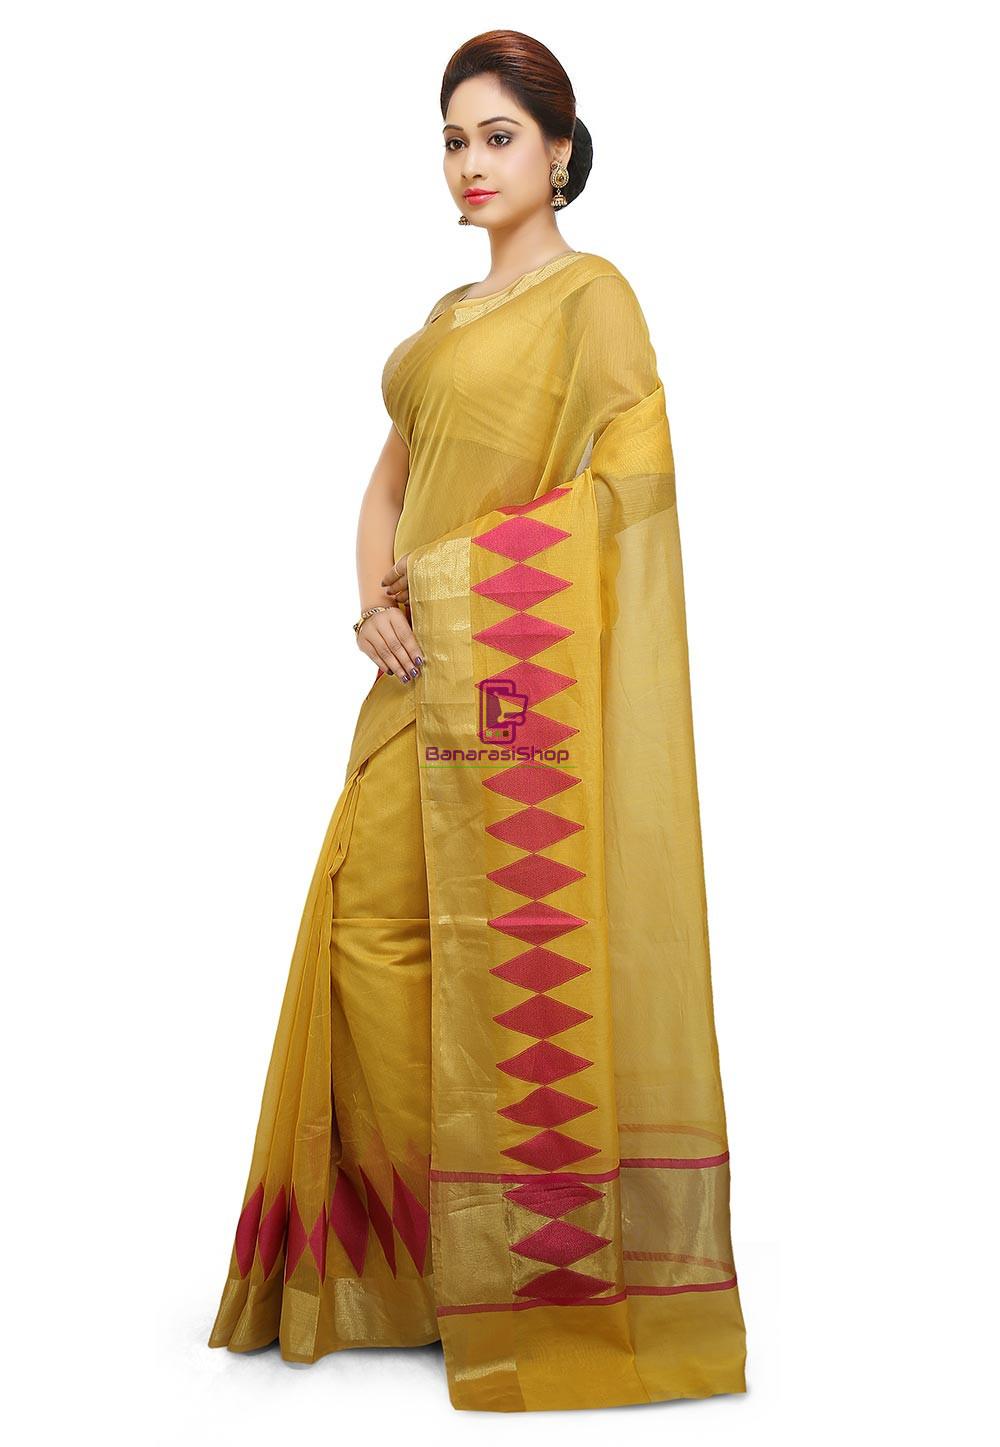 Woven Banarasi Cotton Silk Saree in Yellow 4